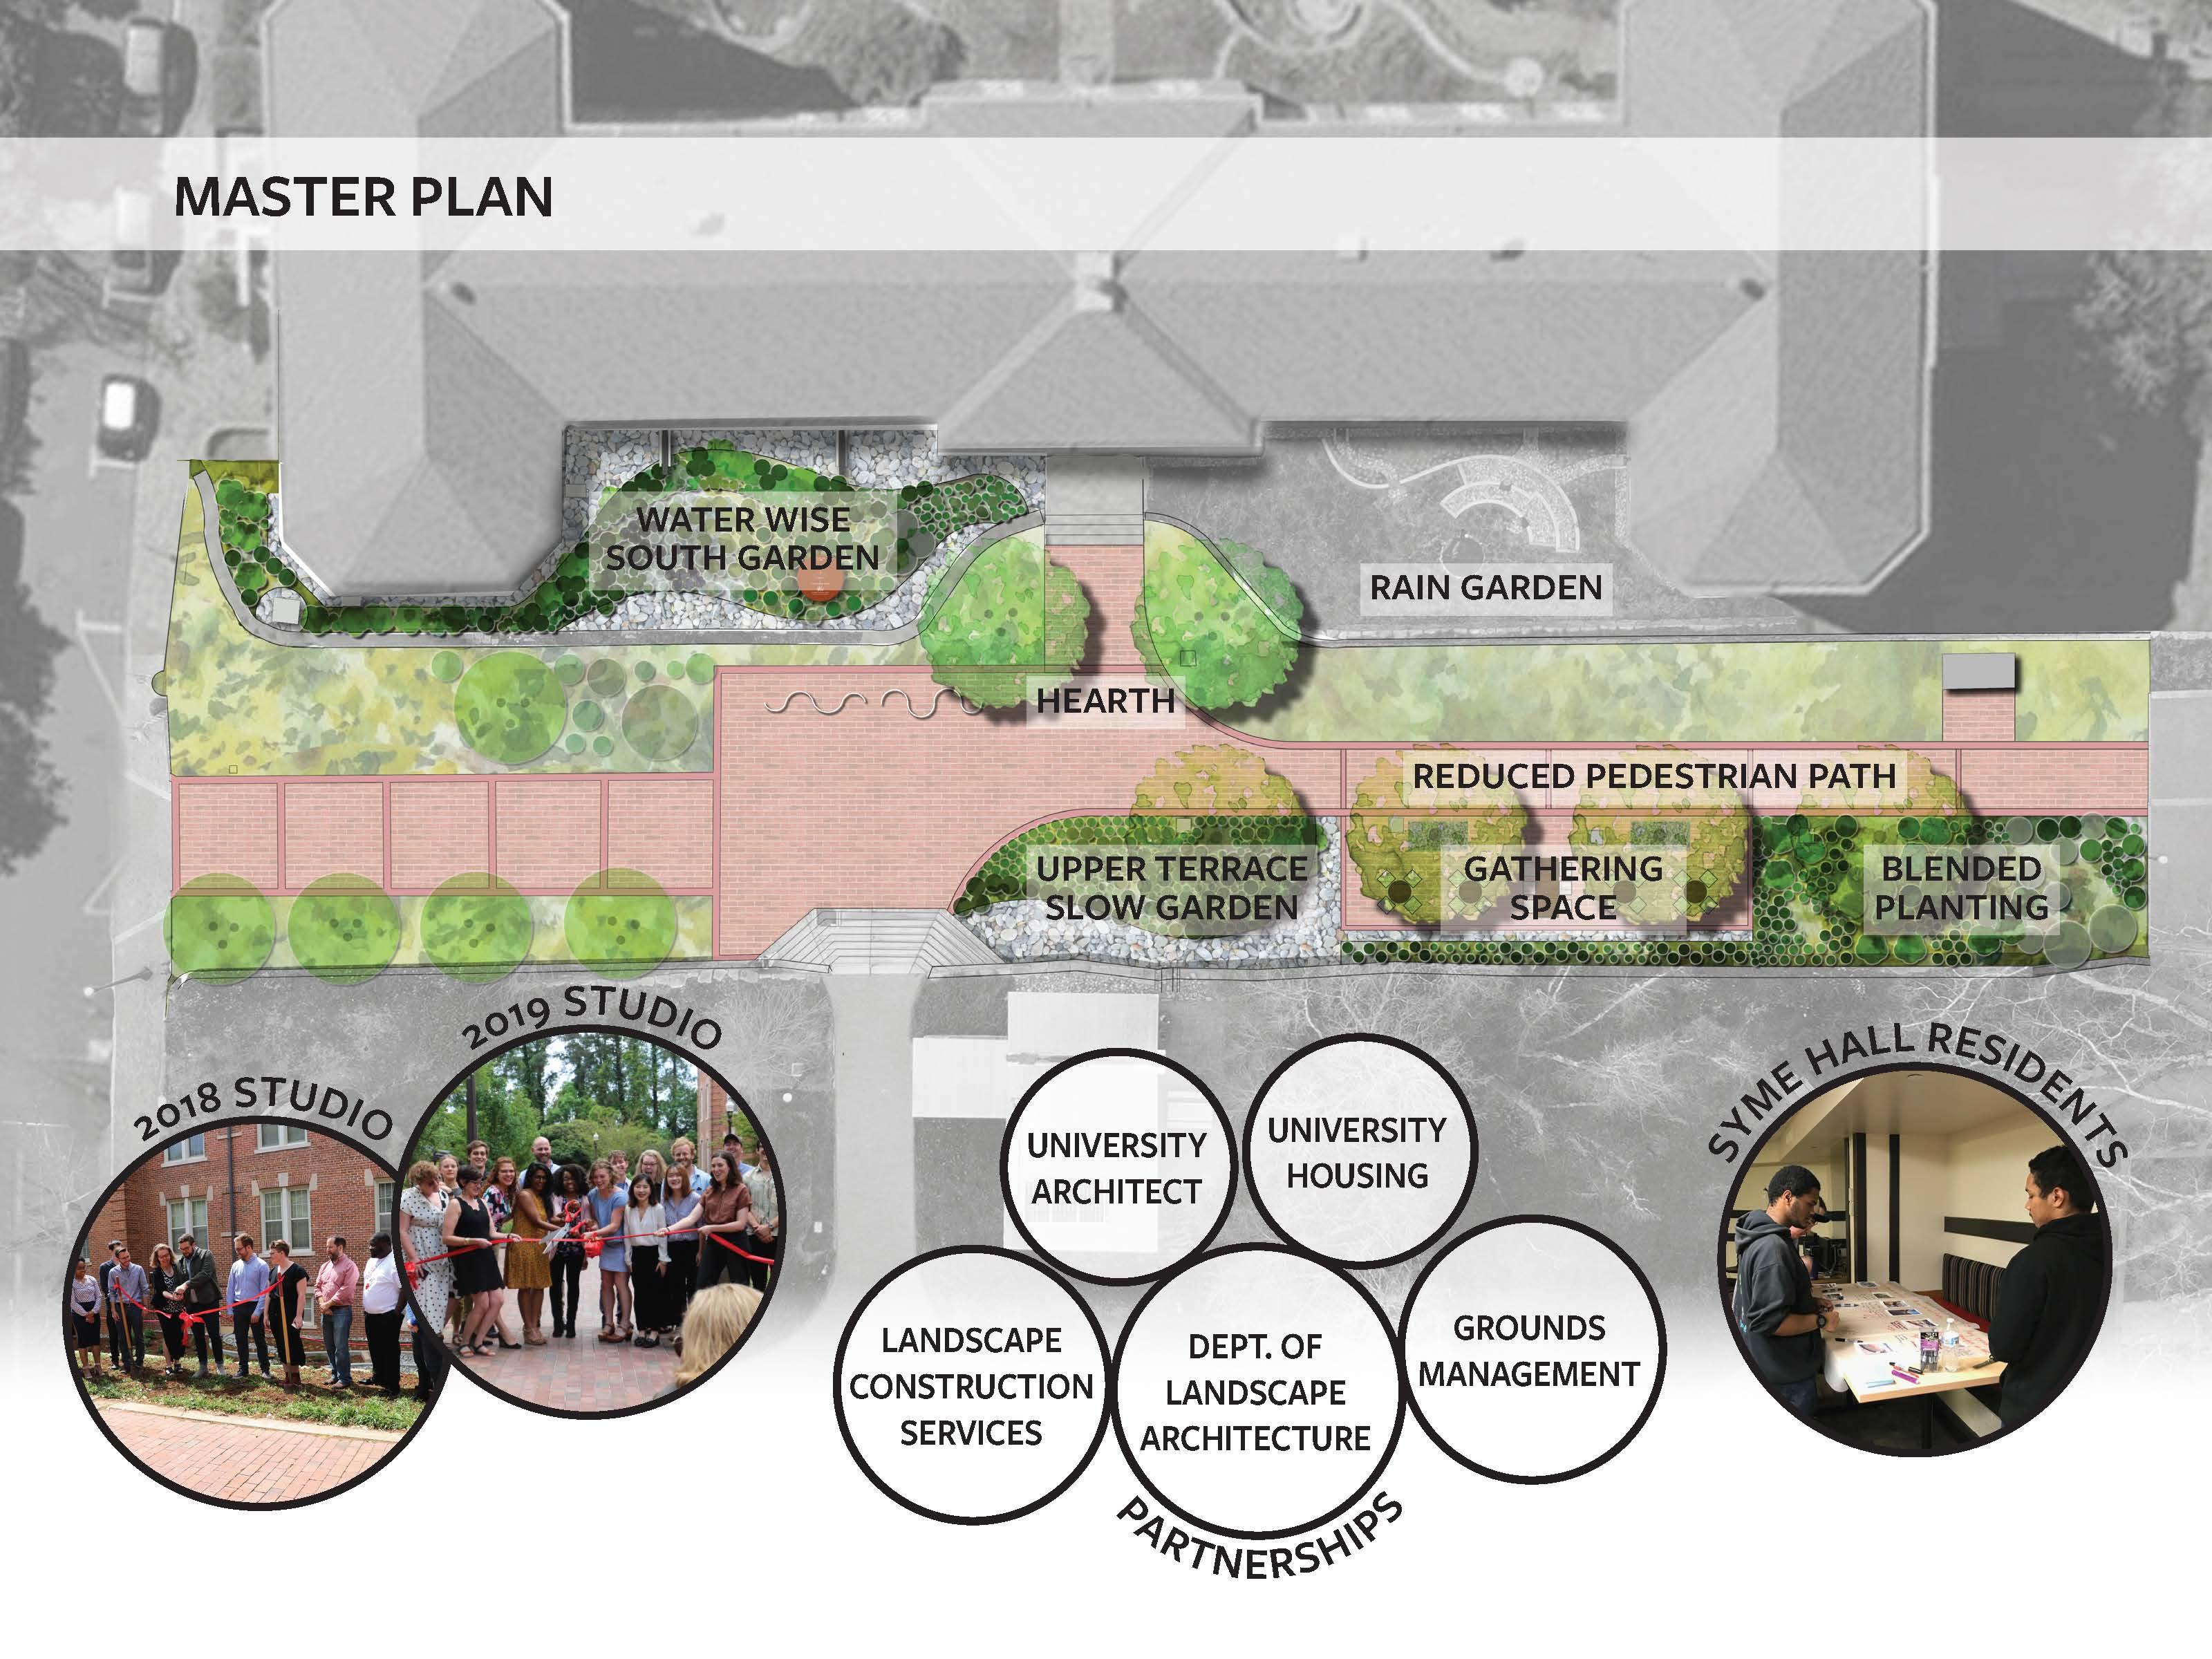 Design Build Program Wins Sir Walter Raleigh Award College Of Design